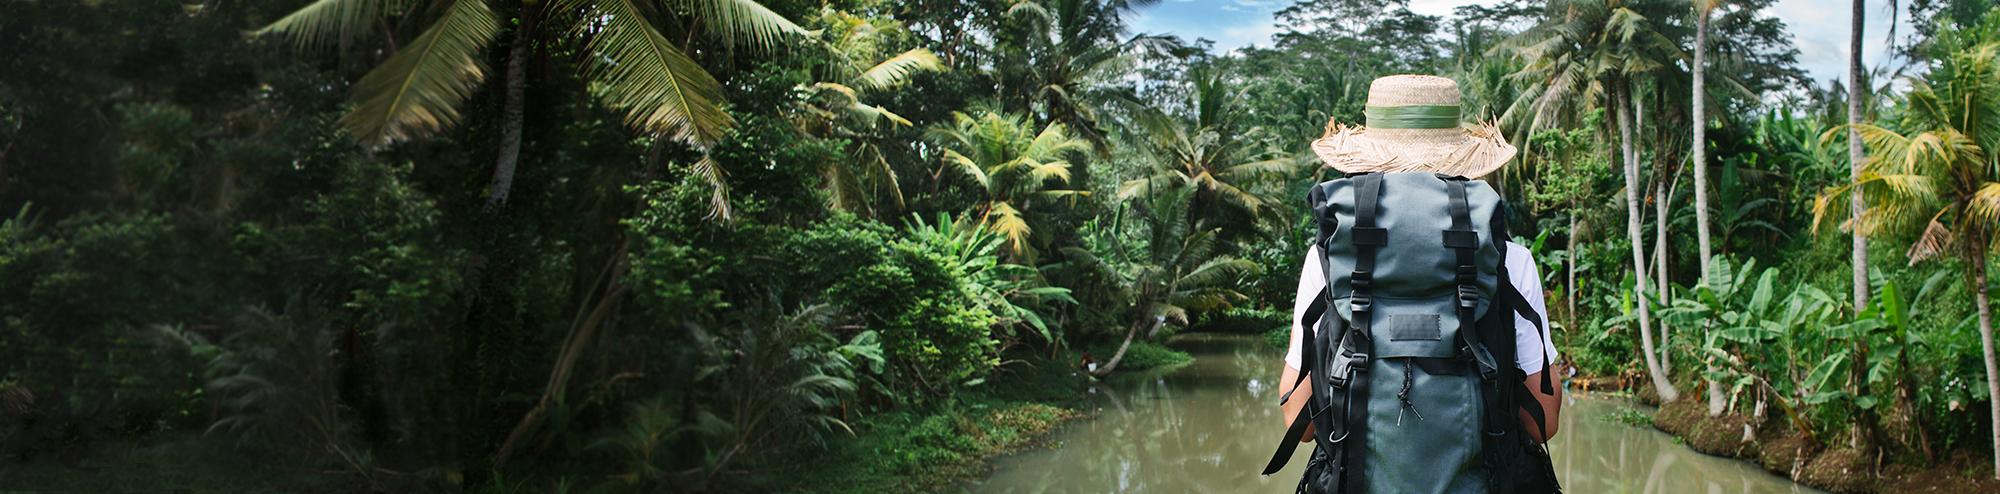 Development of tropical disease medicines